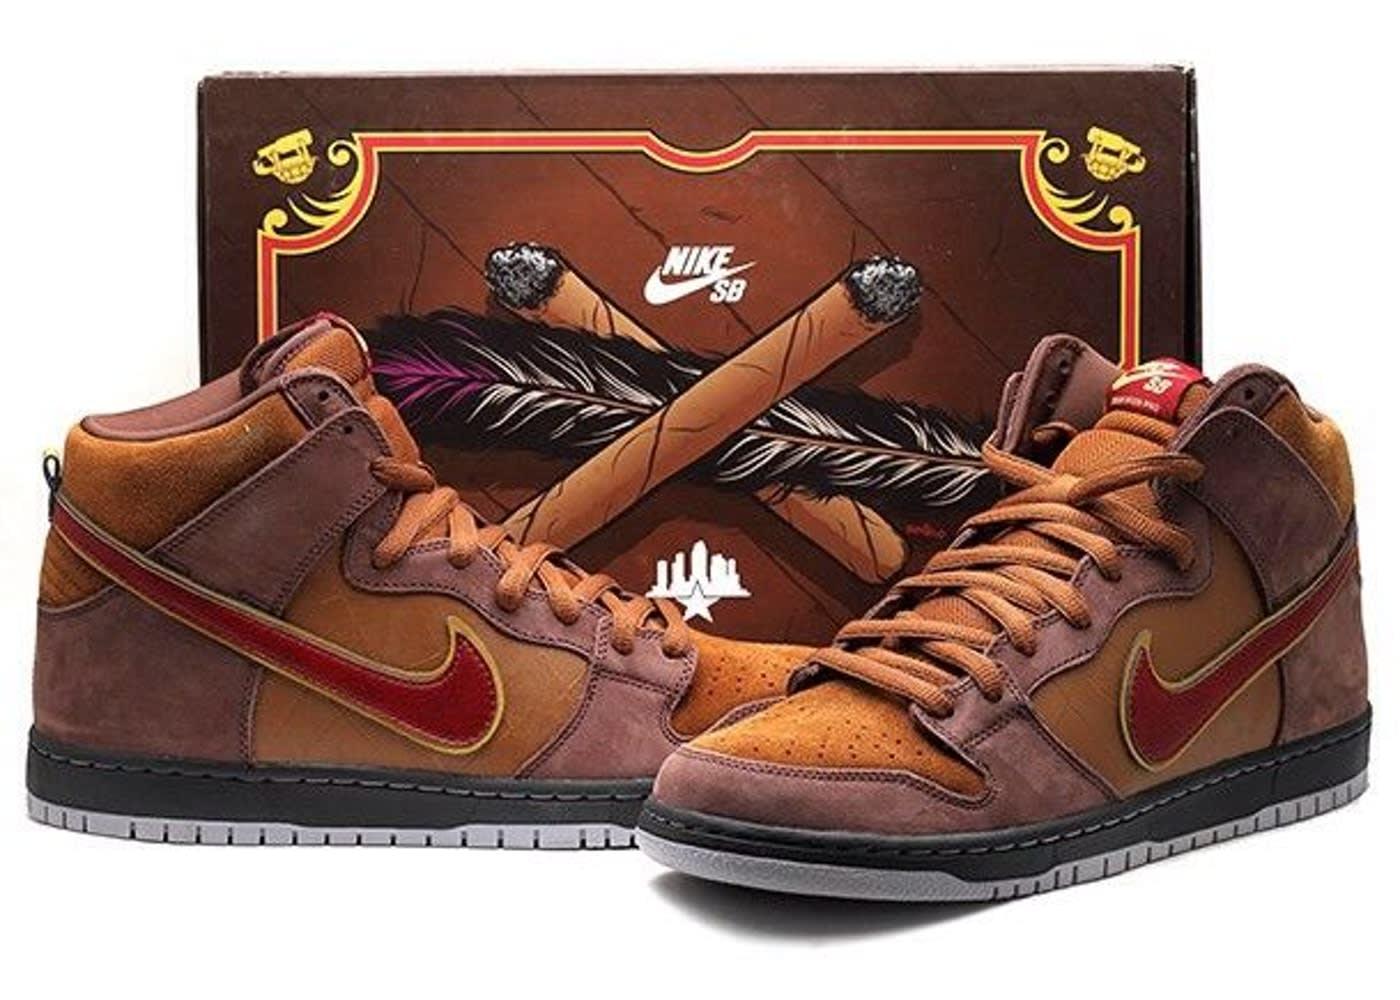 Nike SB Dunk High 'Cigar City'